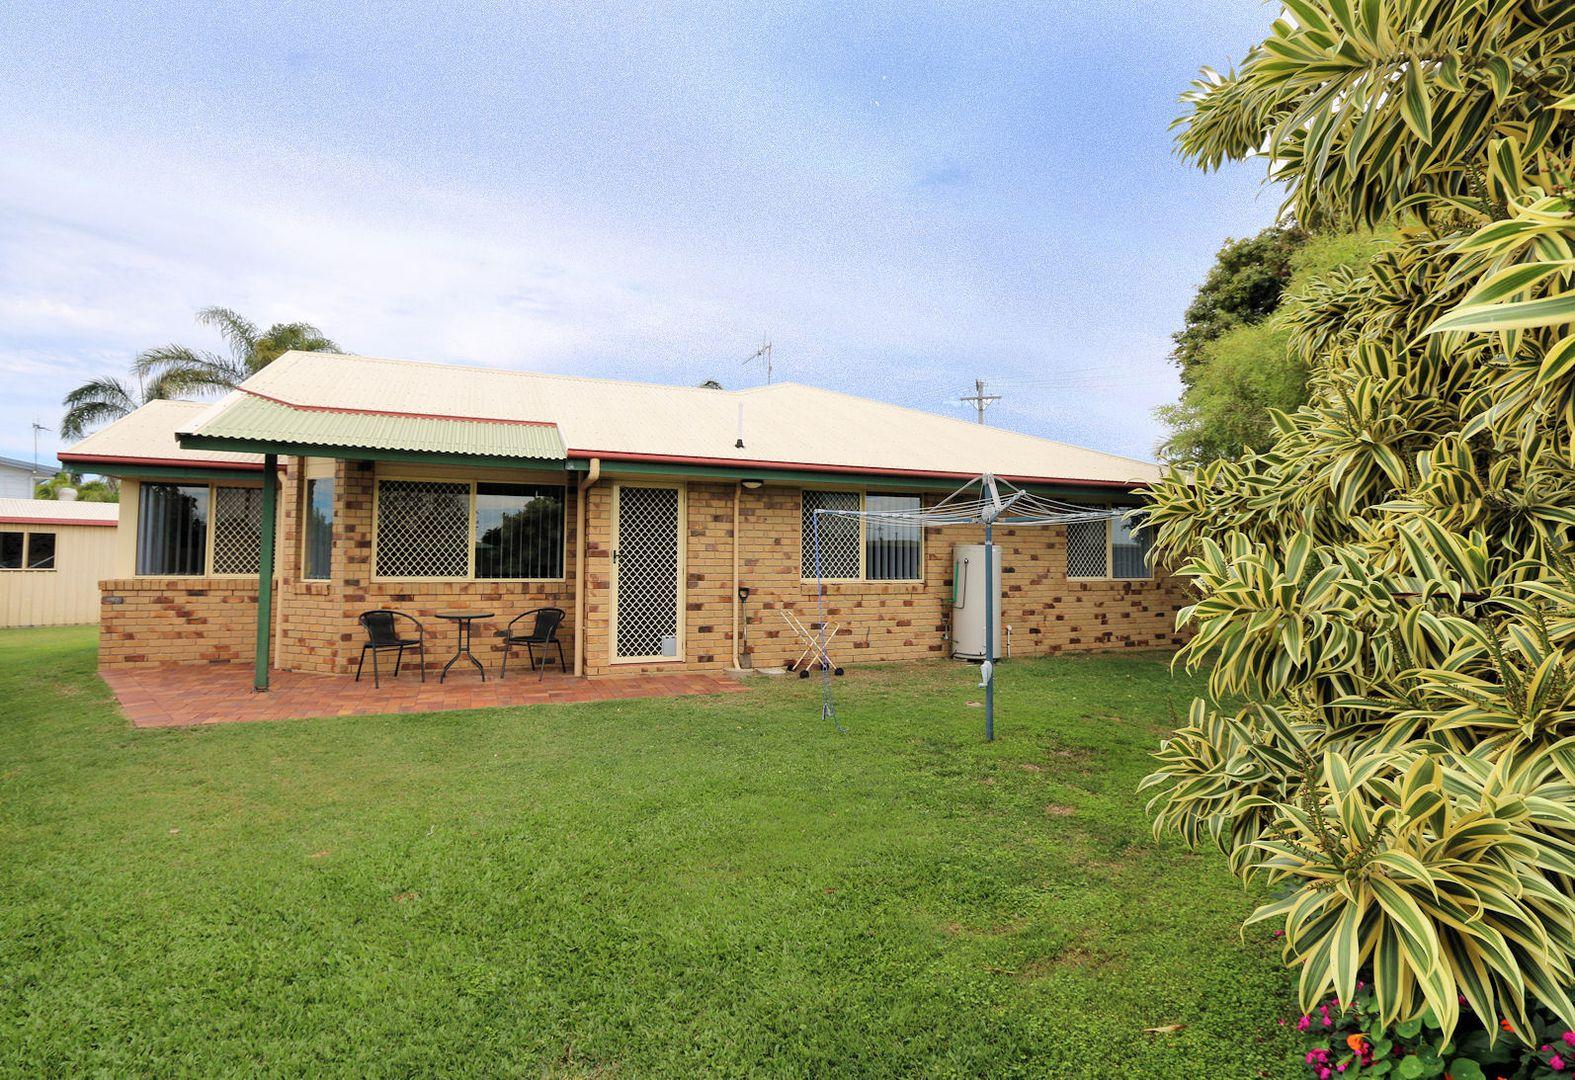 34 Innes Park Rd, Innes Park QLD 4670, Image 2